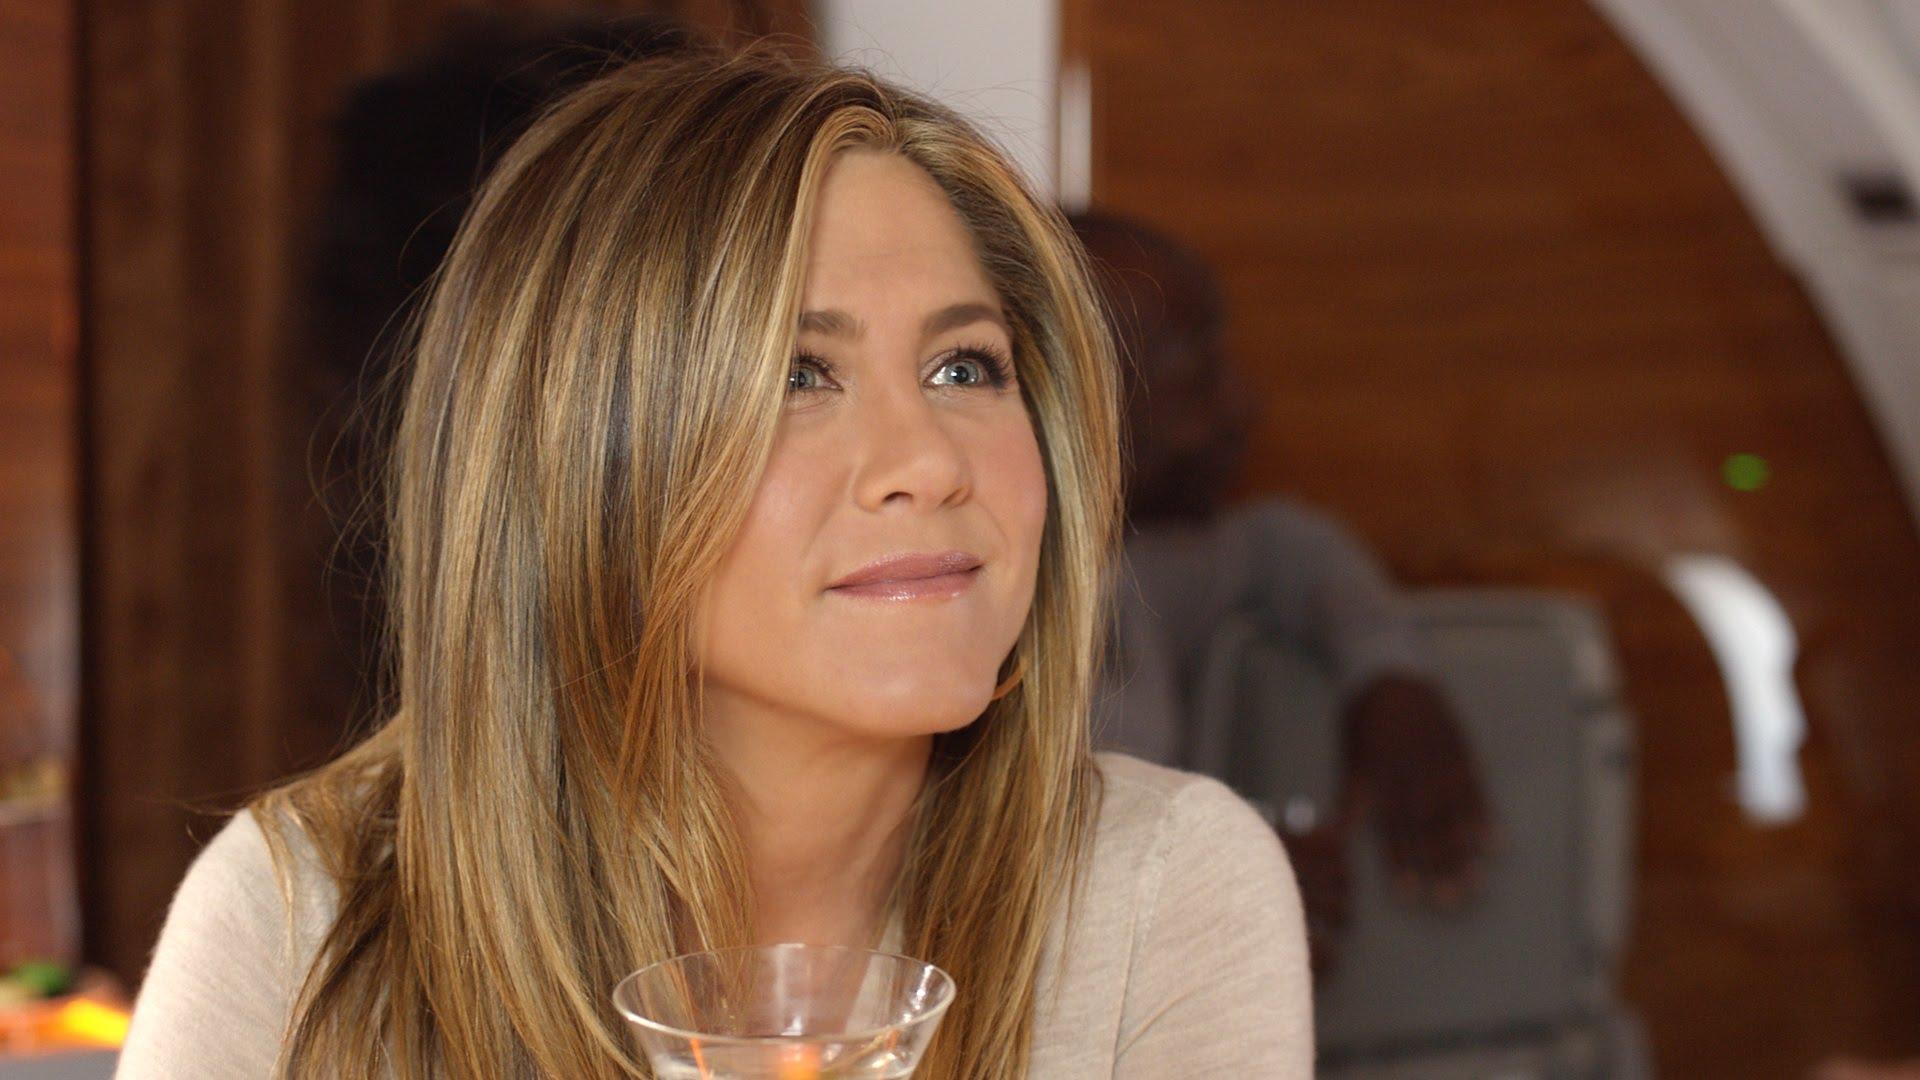 HQ Jennifer Aniston Wallpapers | File 243.69Kb